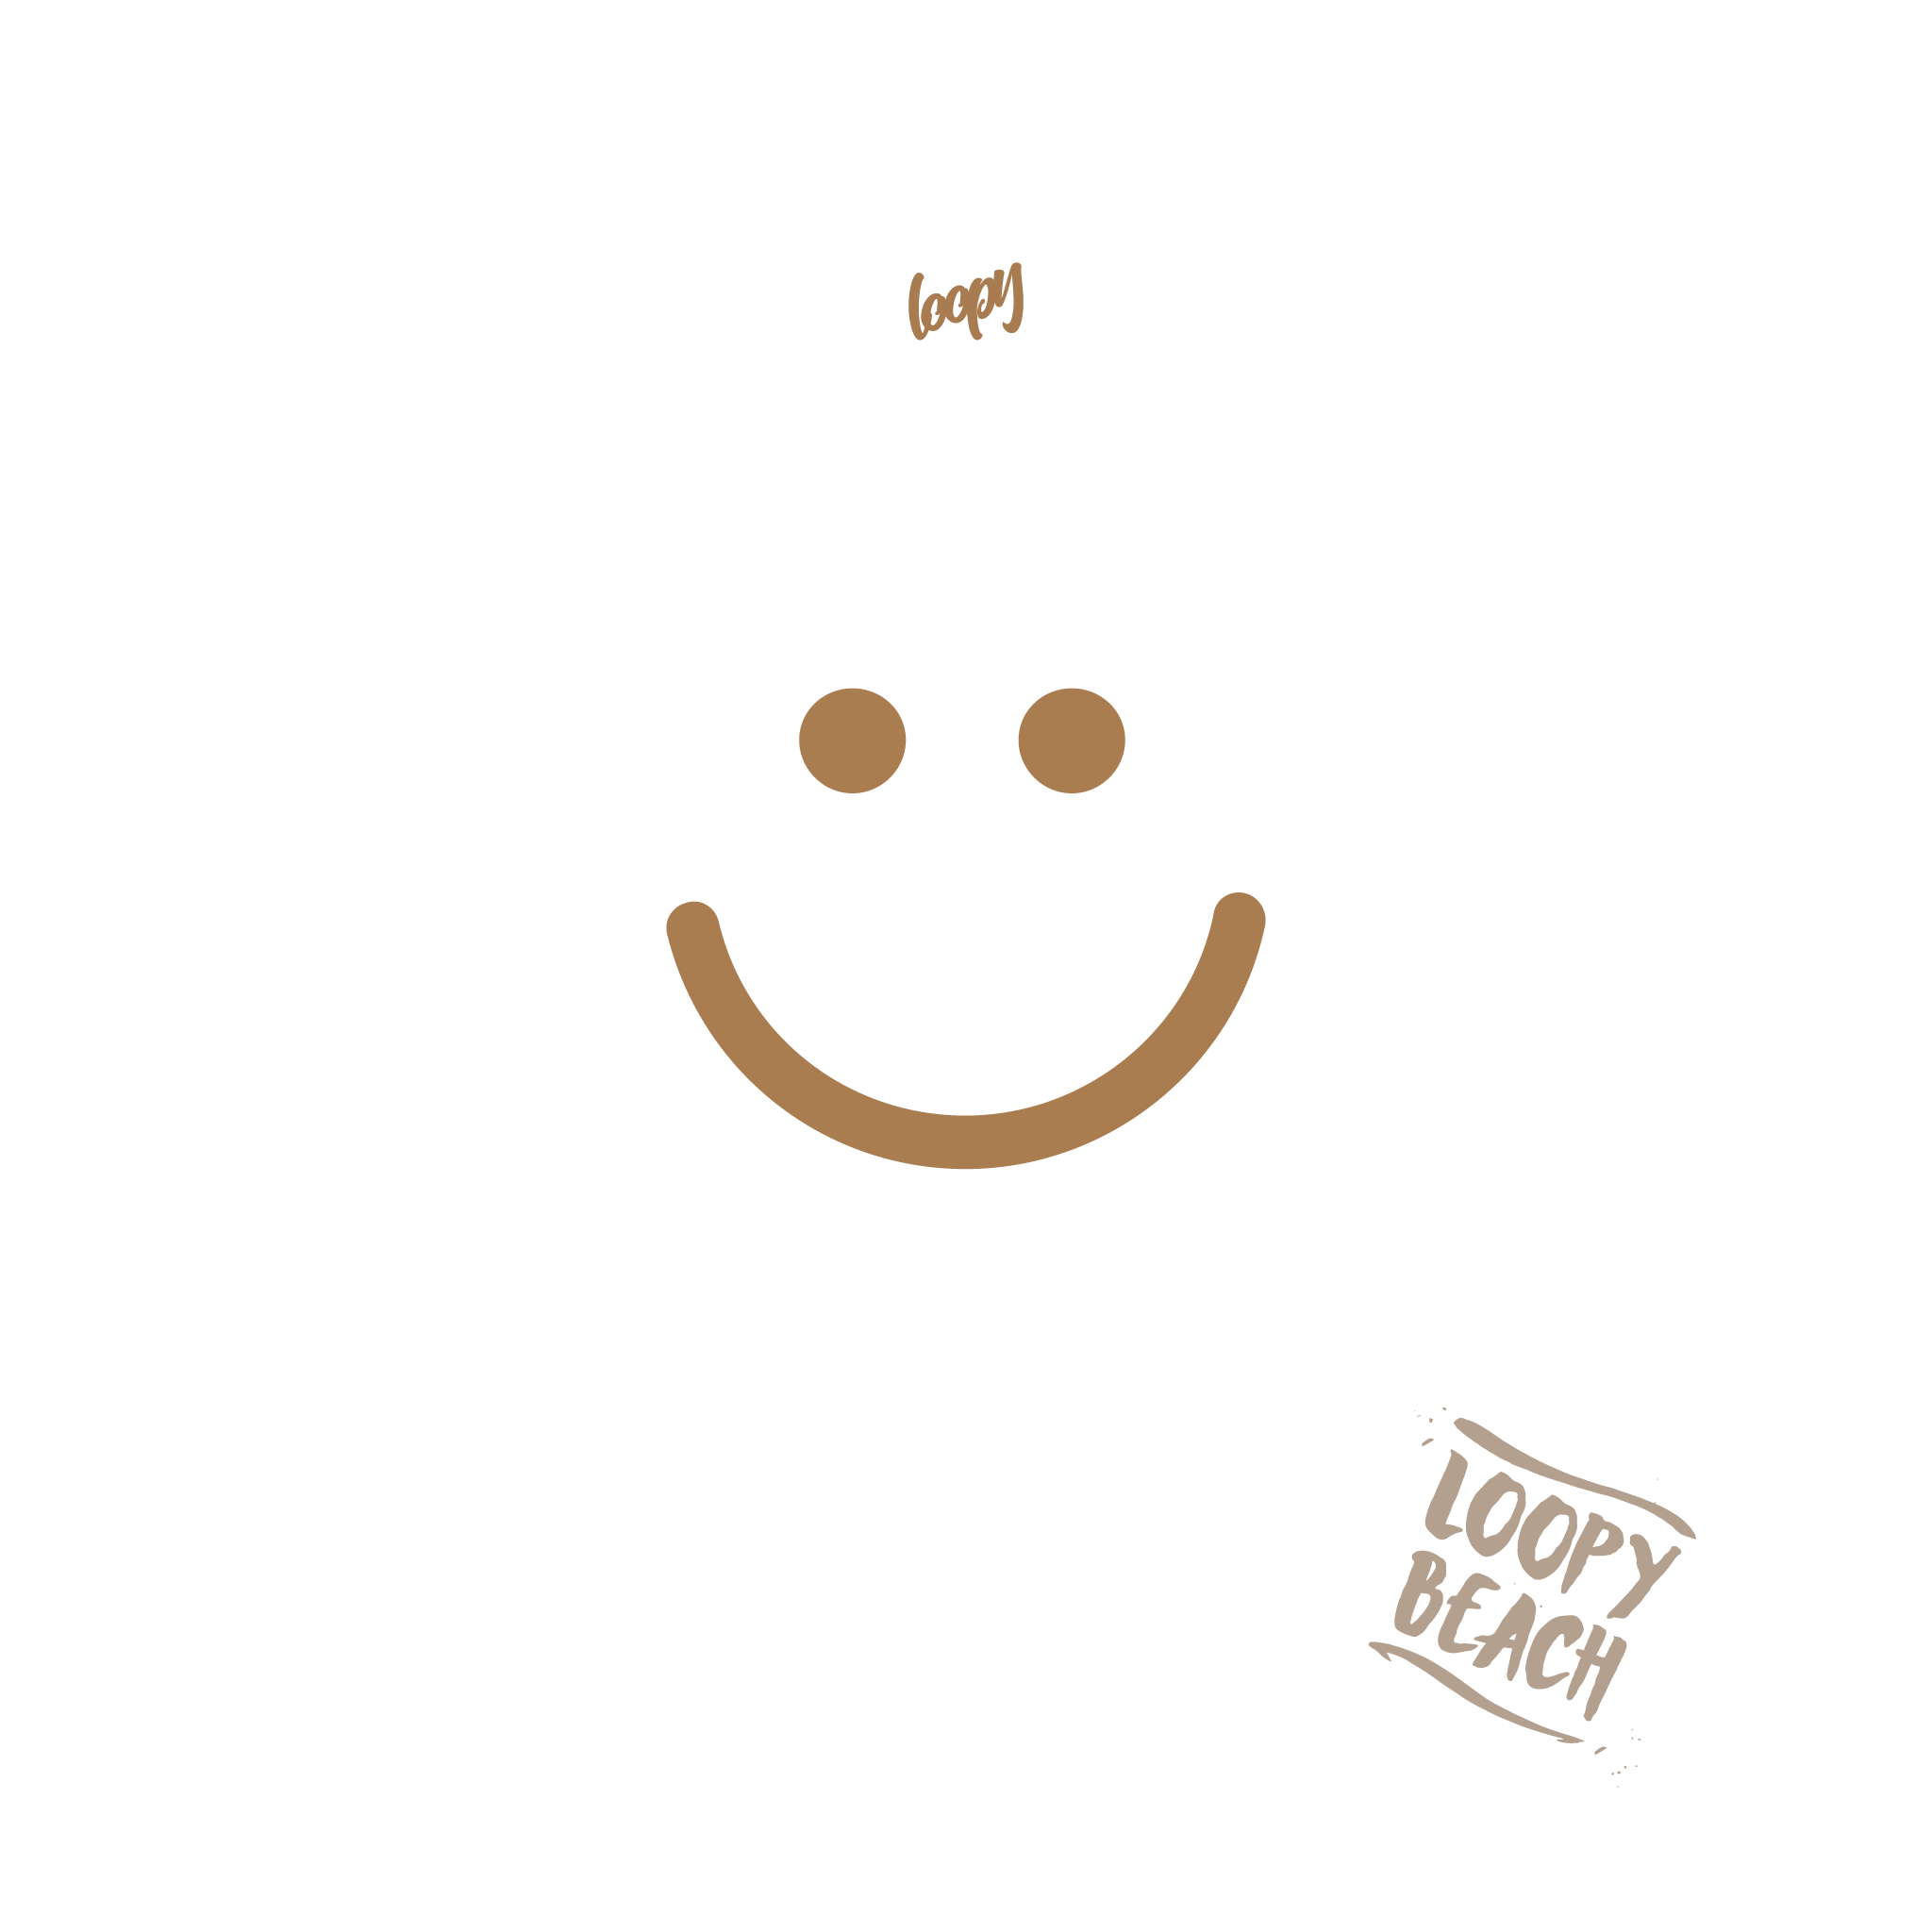 LOOPY-BEACH-INSTAGRAM-HAPPYWEB.png